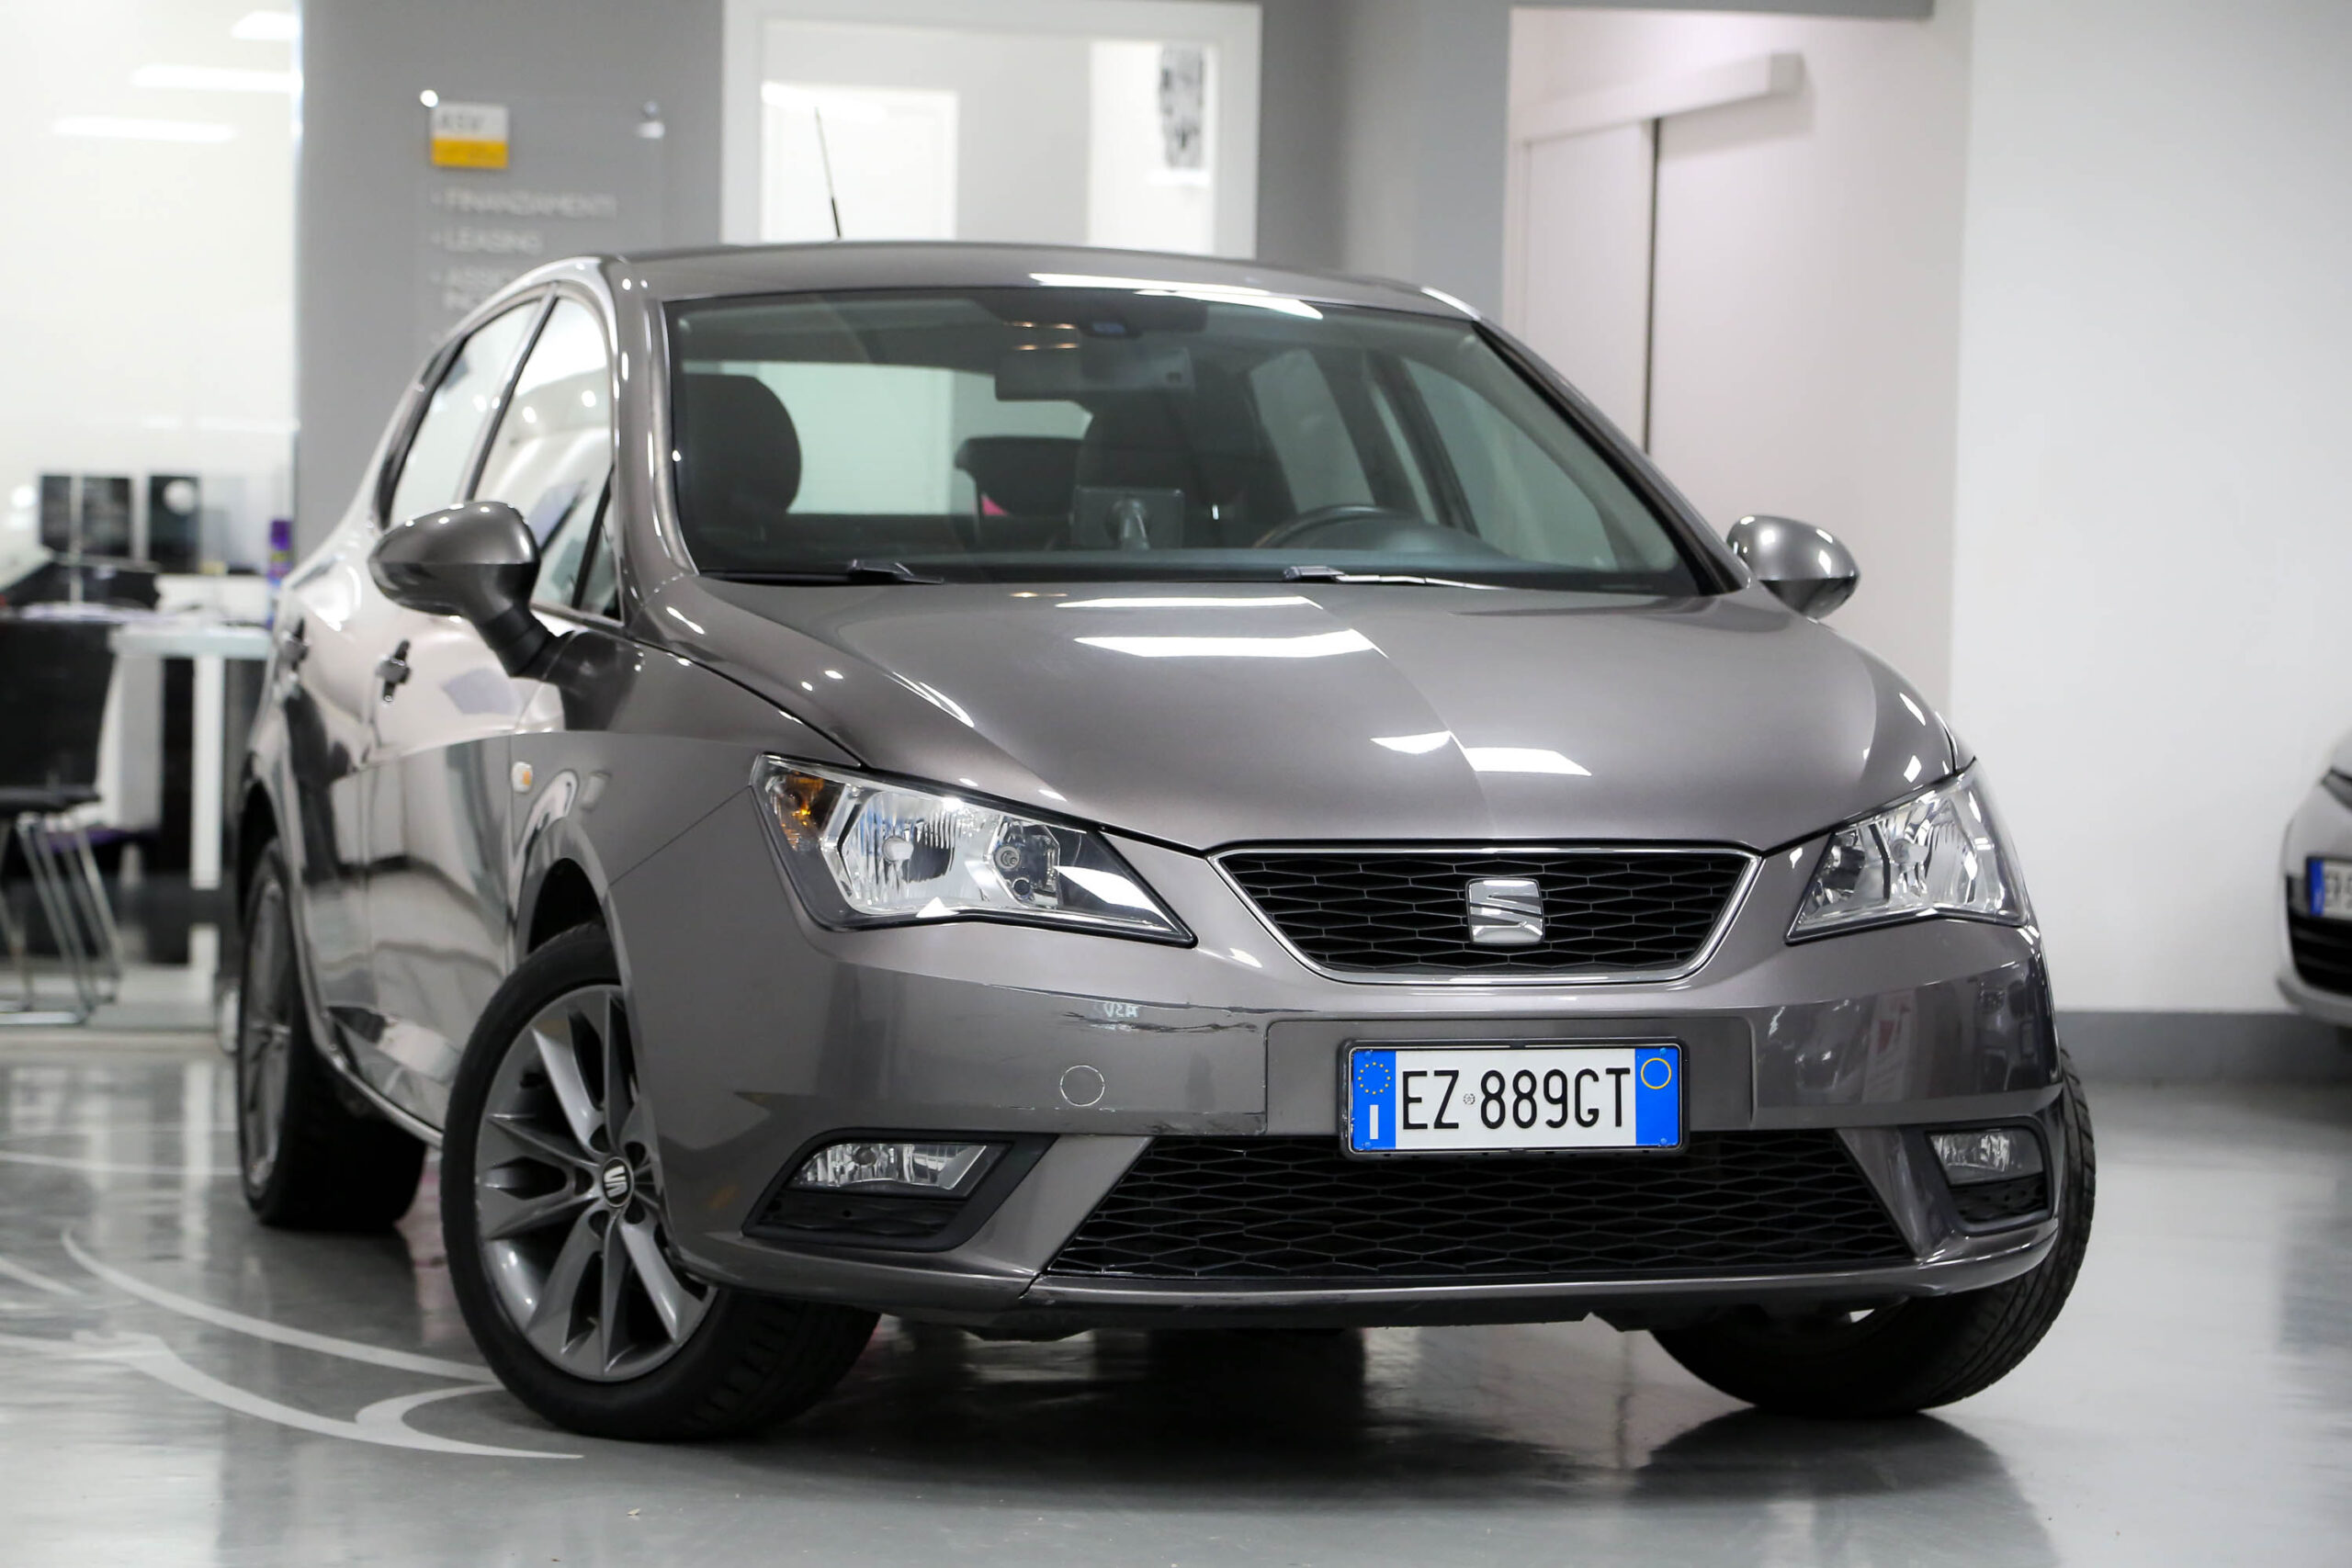 SEAT Ibiza 1.2 TDI CR 5 porte I-Tech